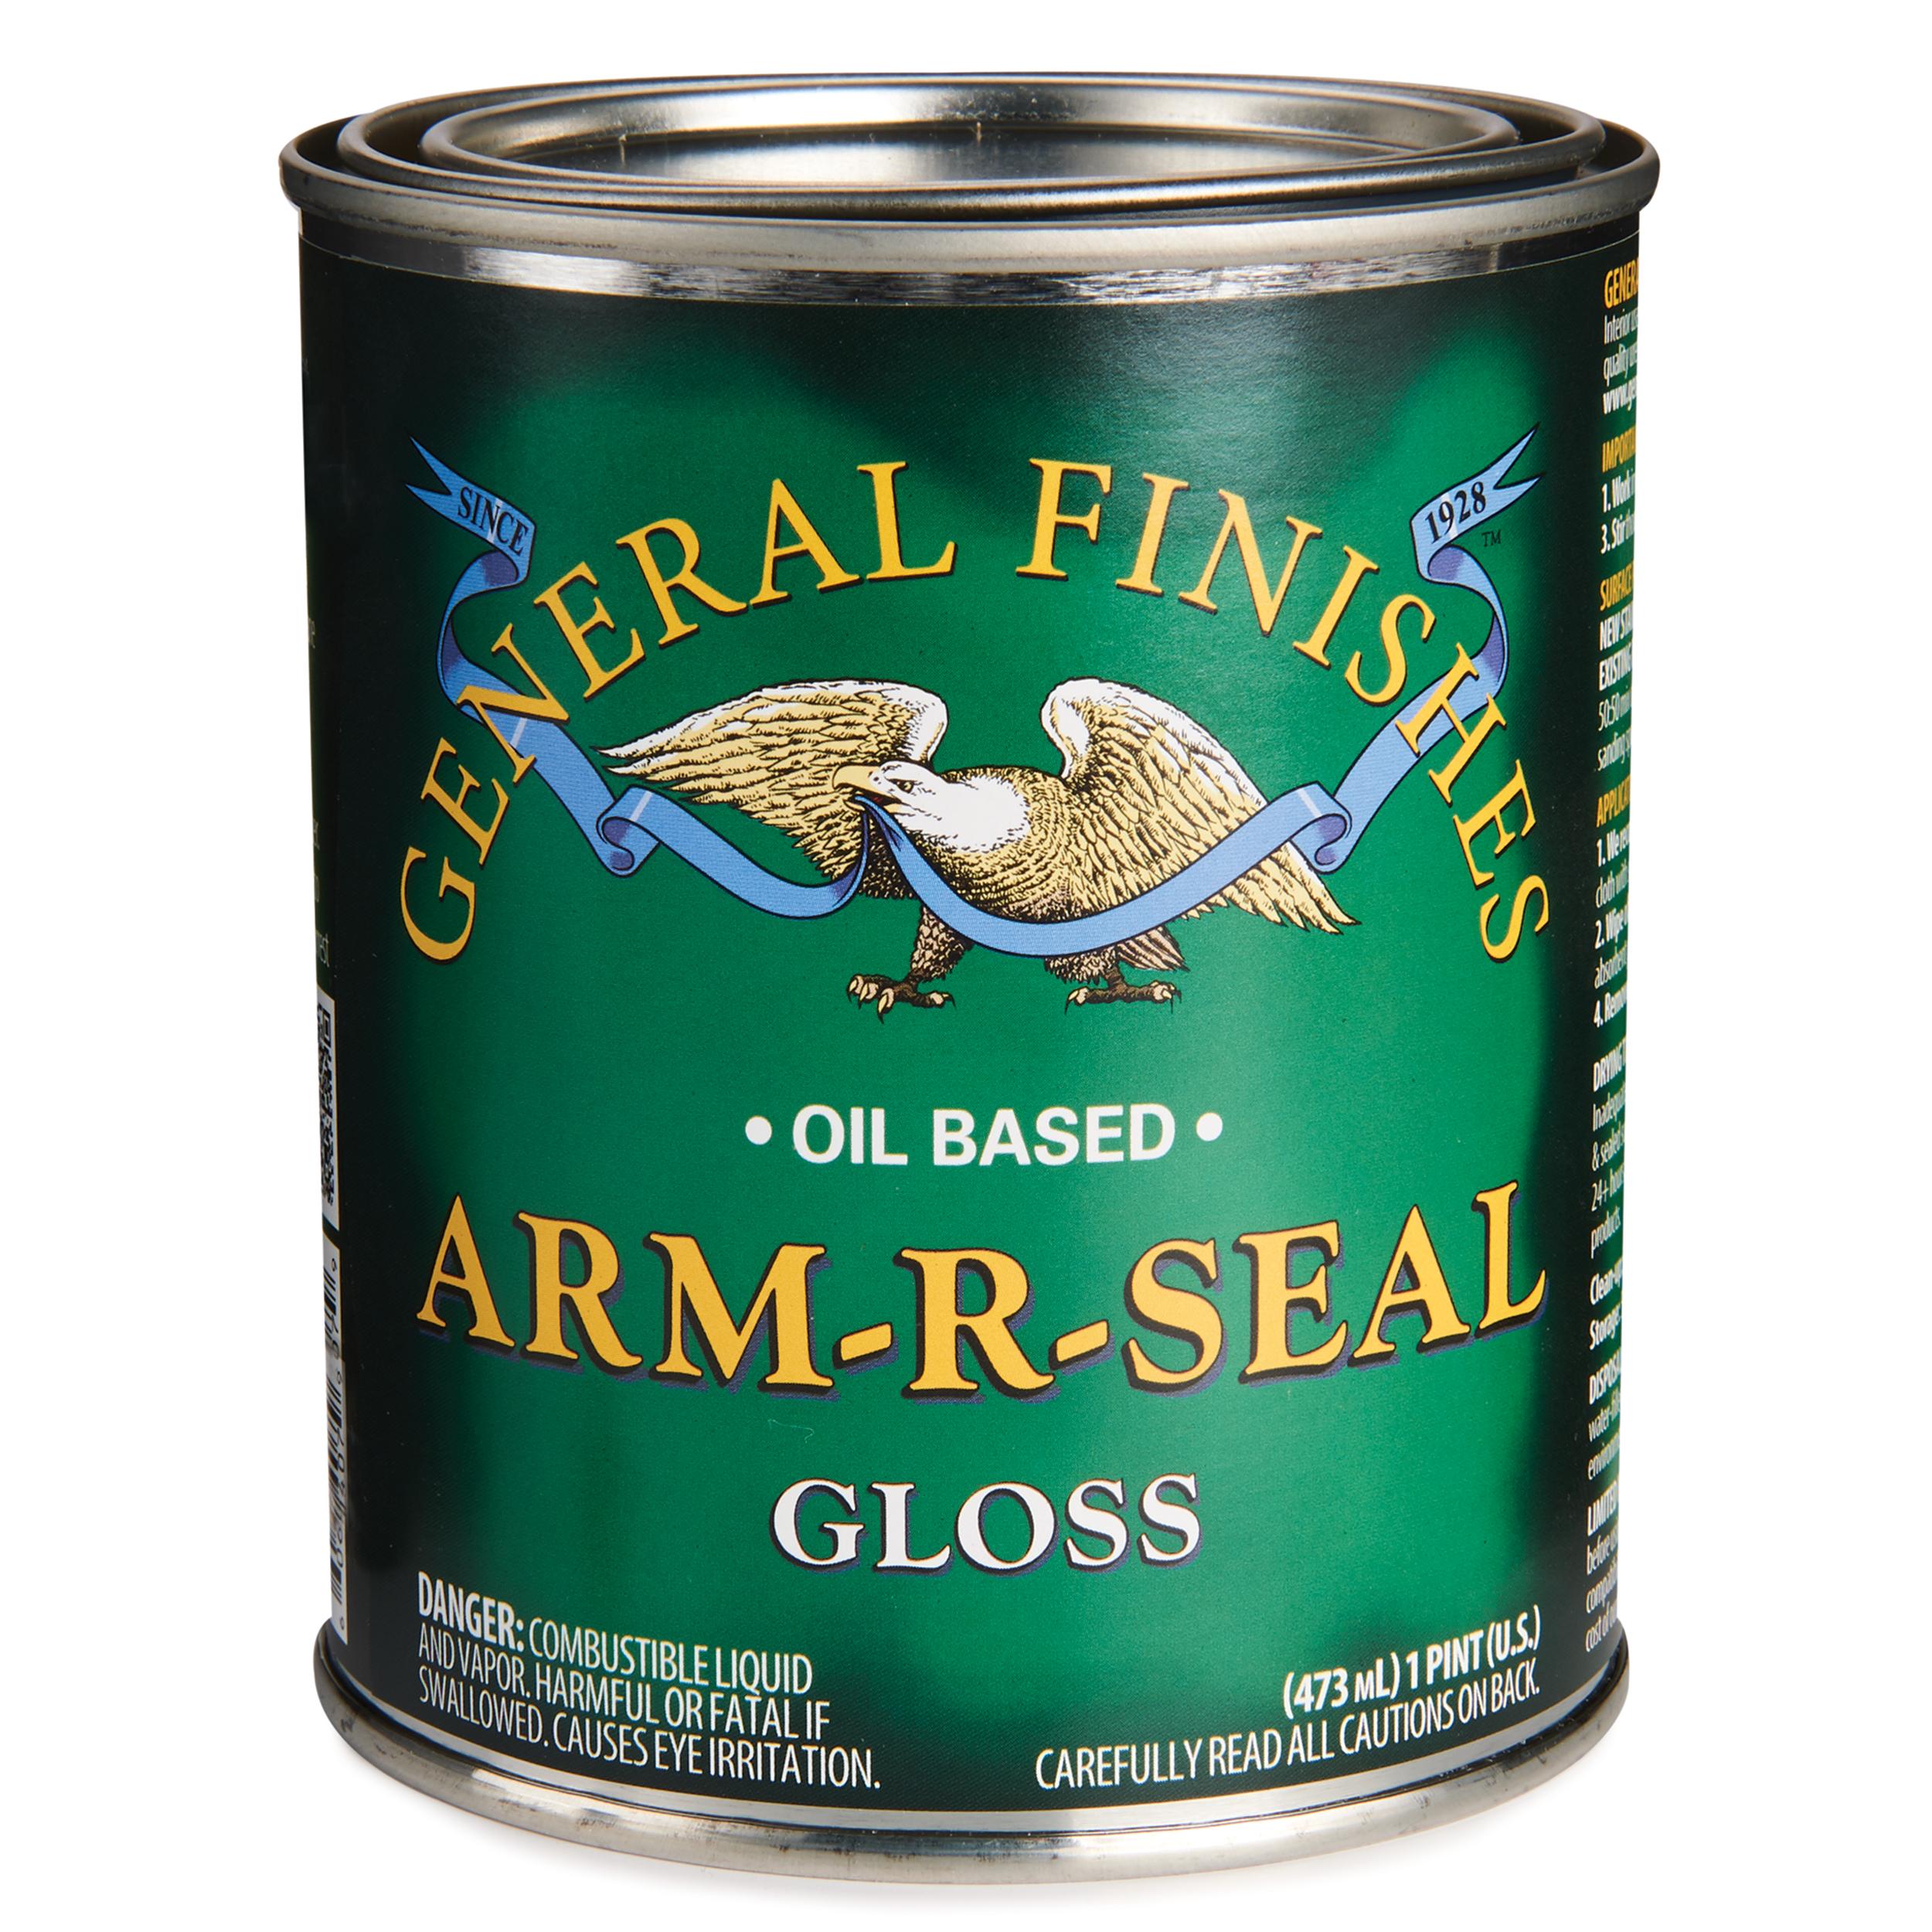 Gloss Arm-R-Seal Varnish Solvent Based Pint